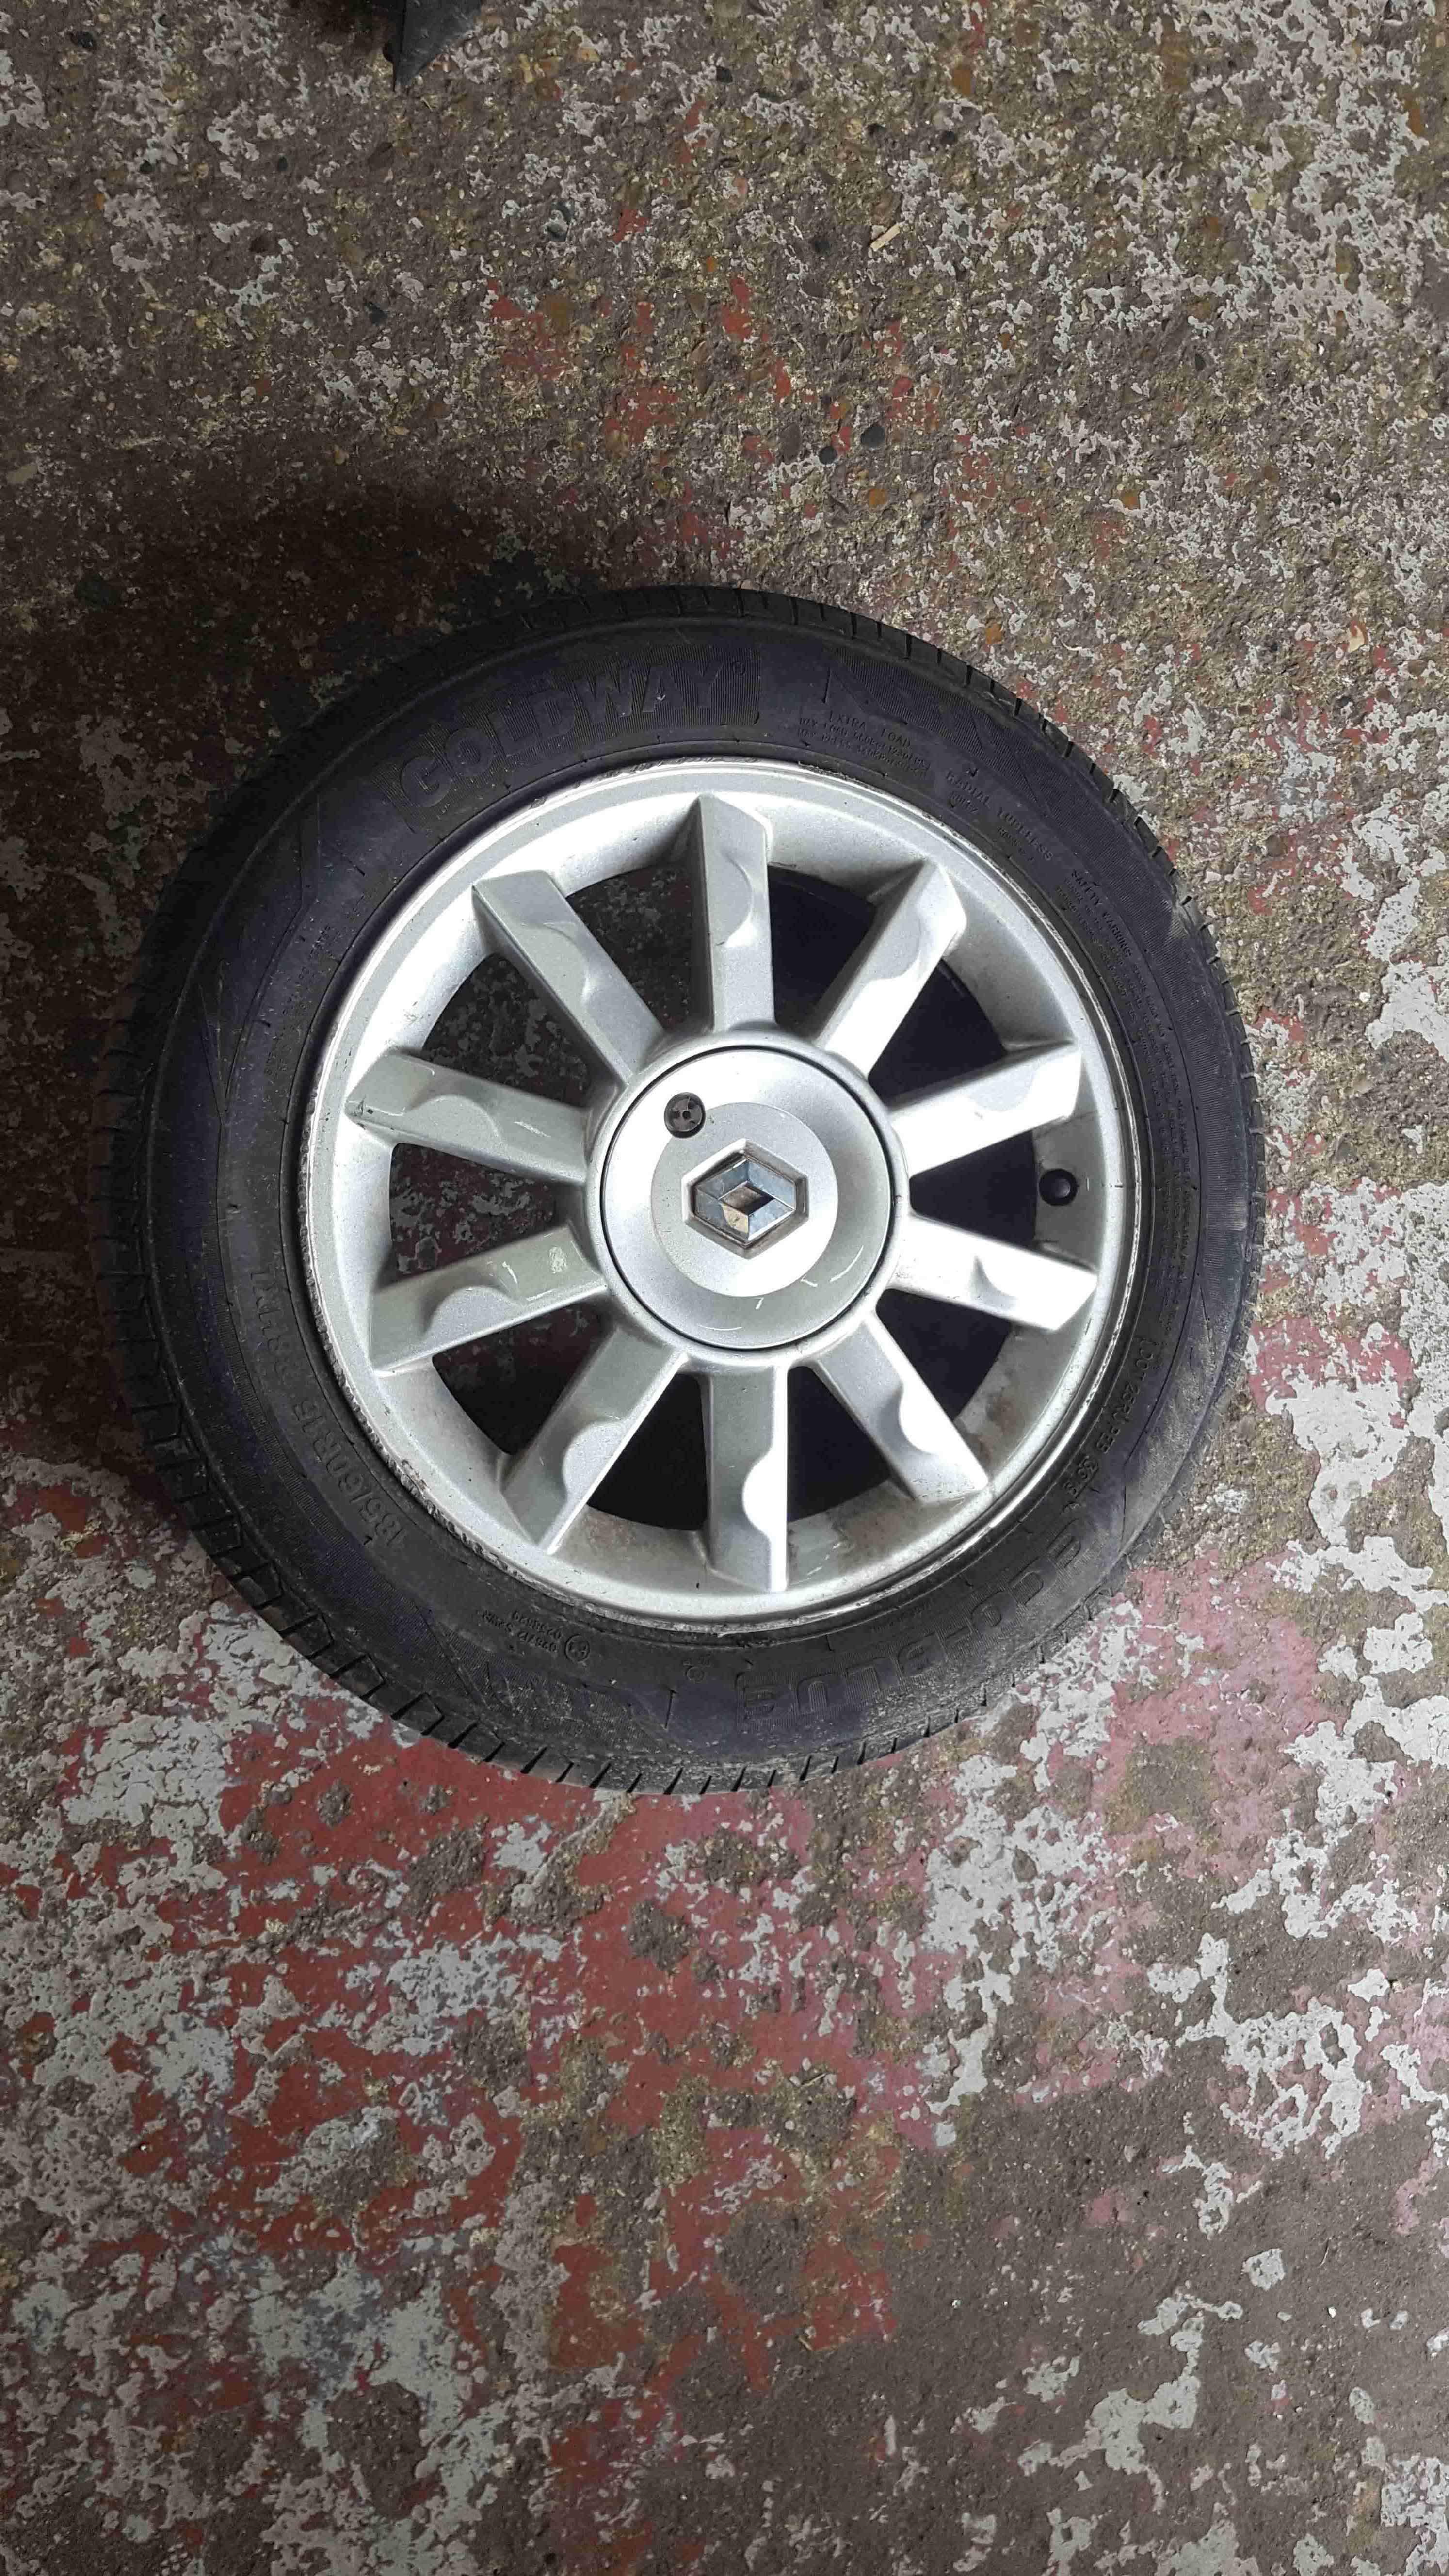 Renault Modus 2004-2008 Kimono Alloy Wheel 15inch + Tyre 185 60 15 6mm